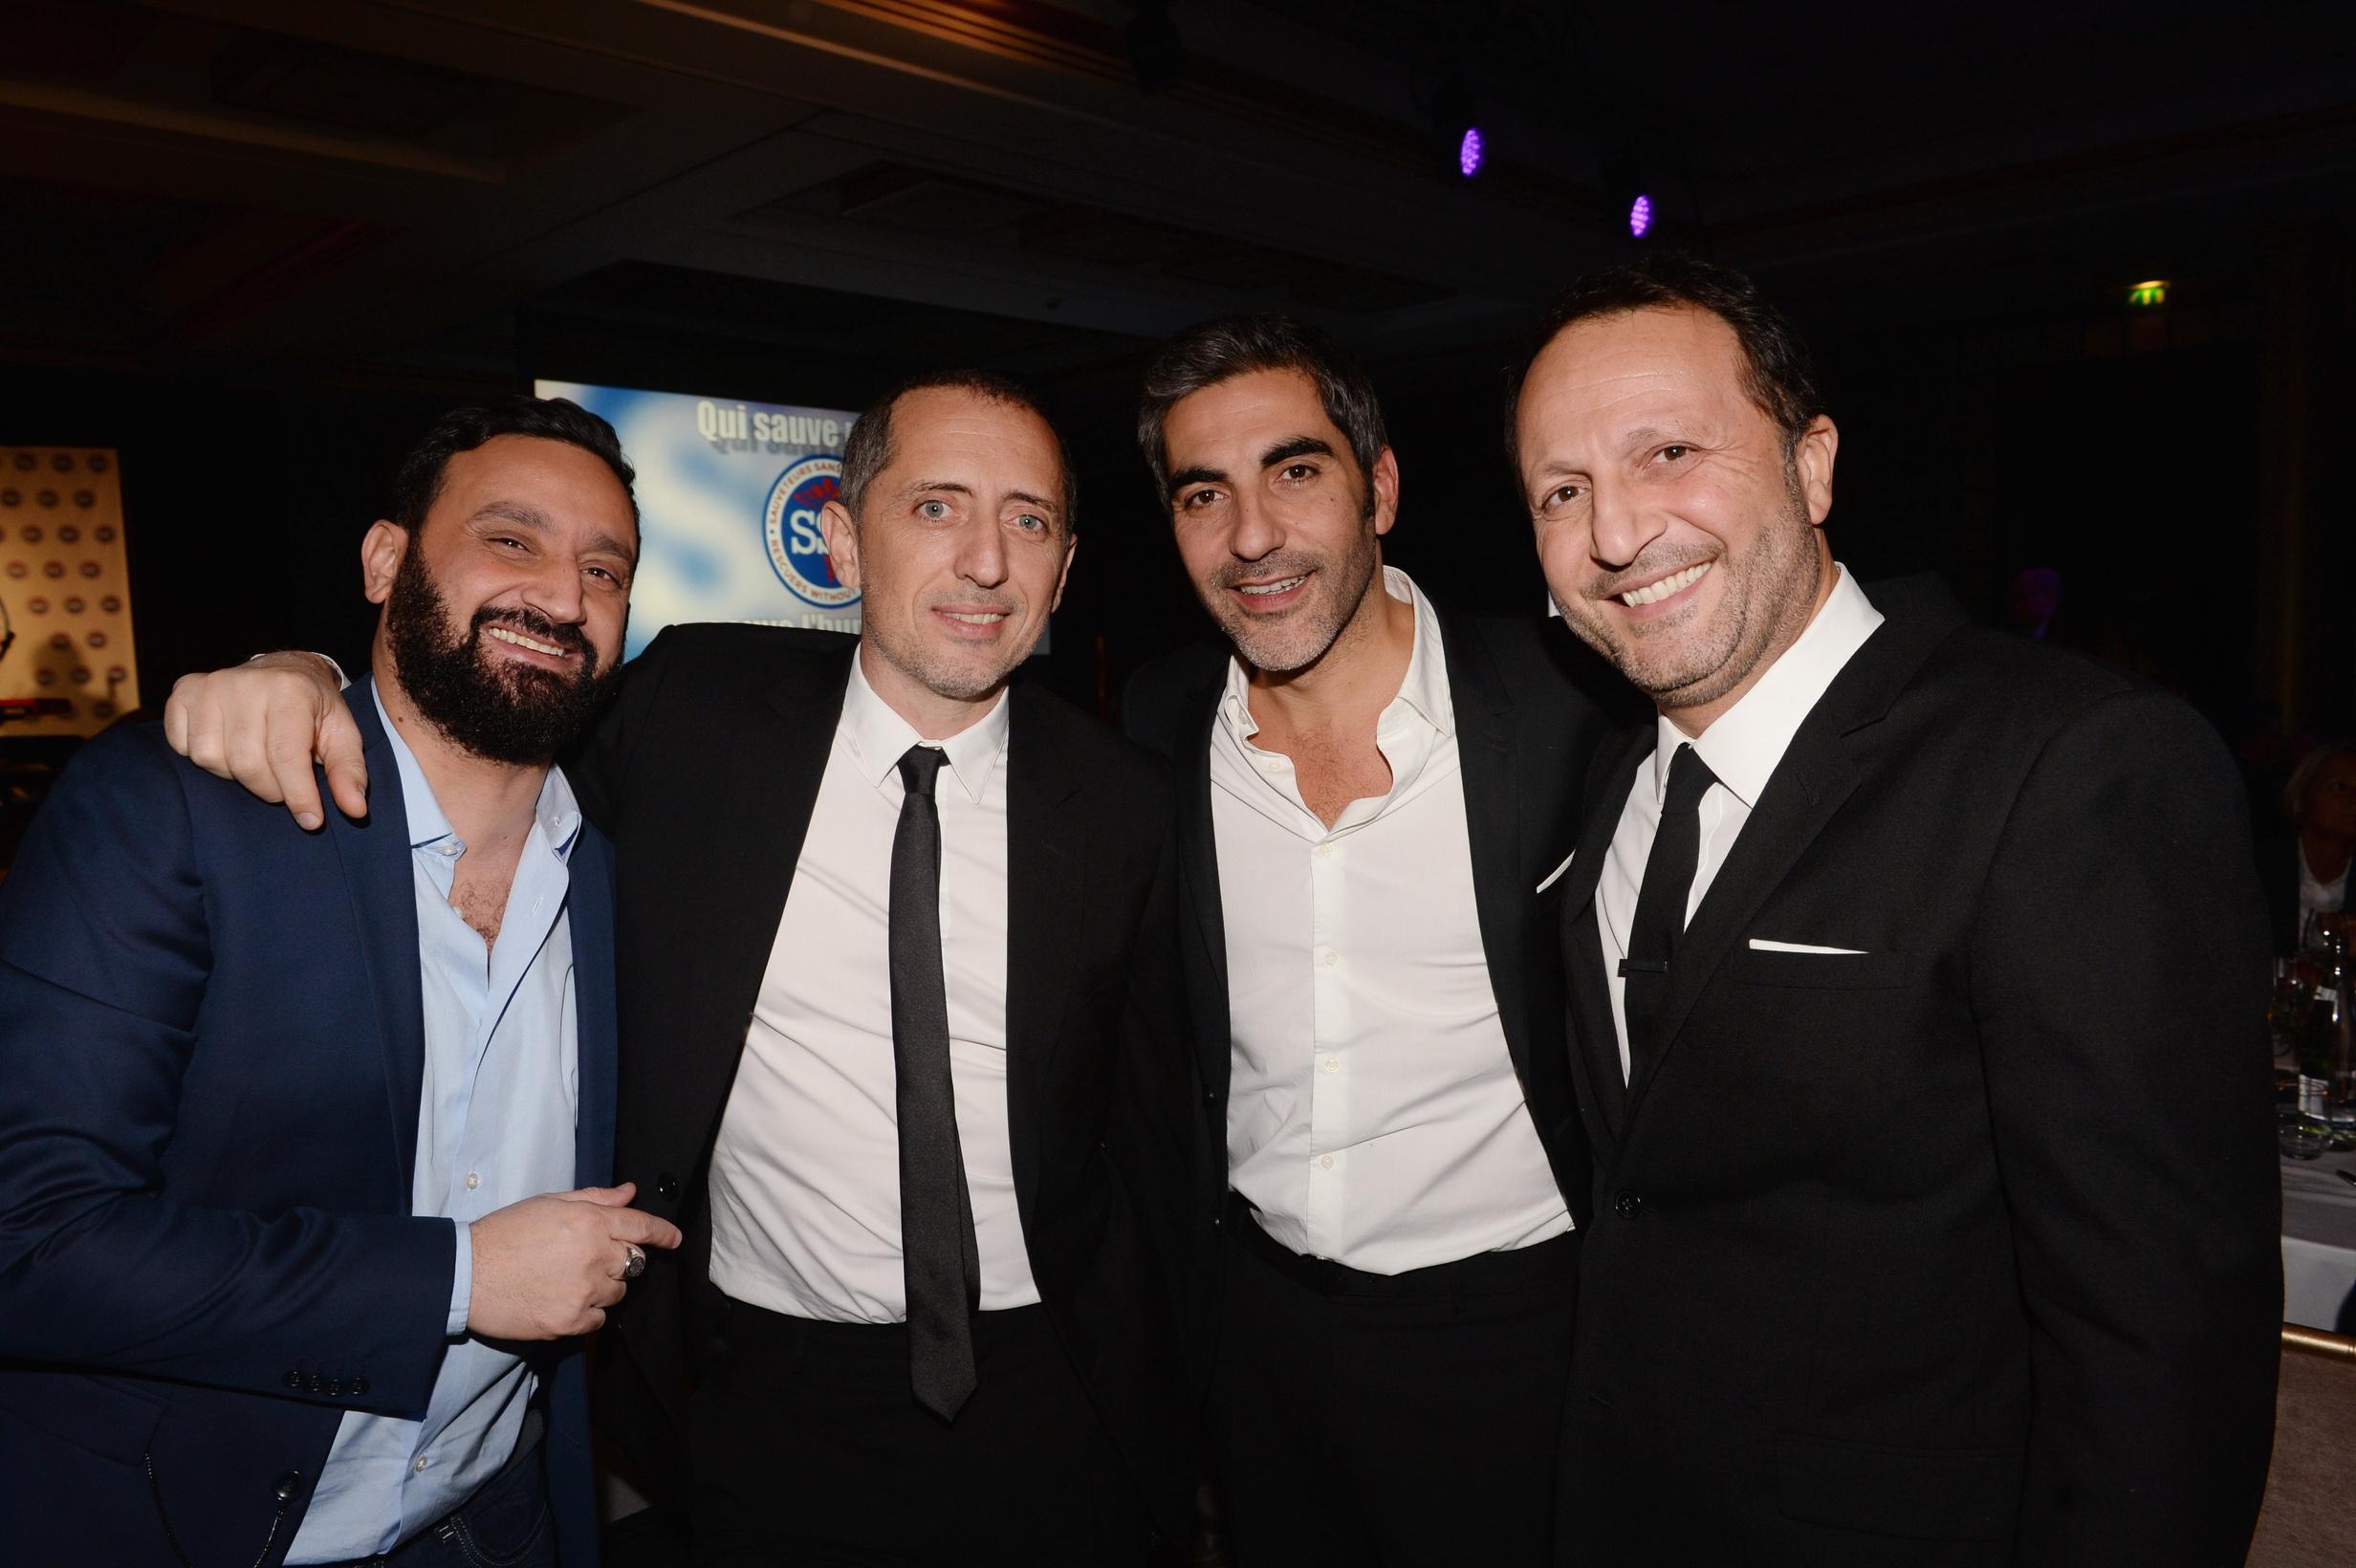 Cyril Hanouna, Gad Elmaleh, Ary Abittan et Arthur